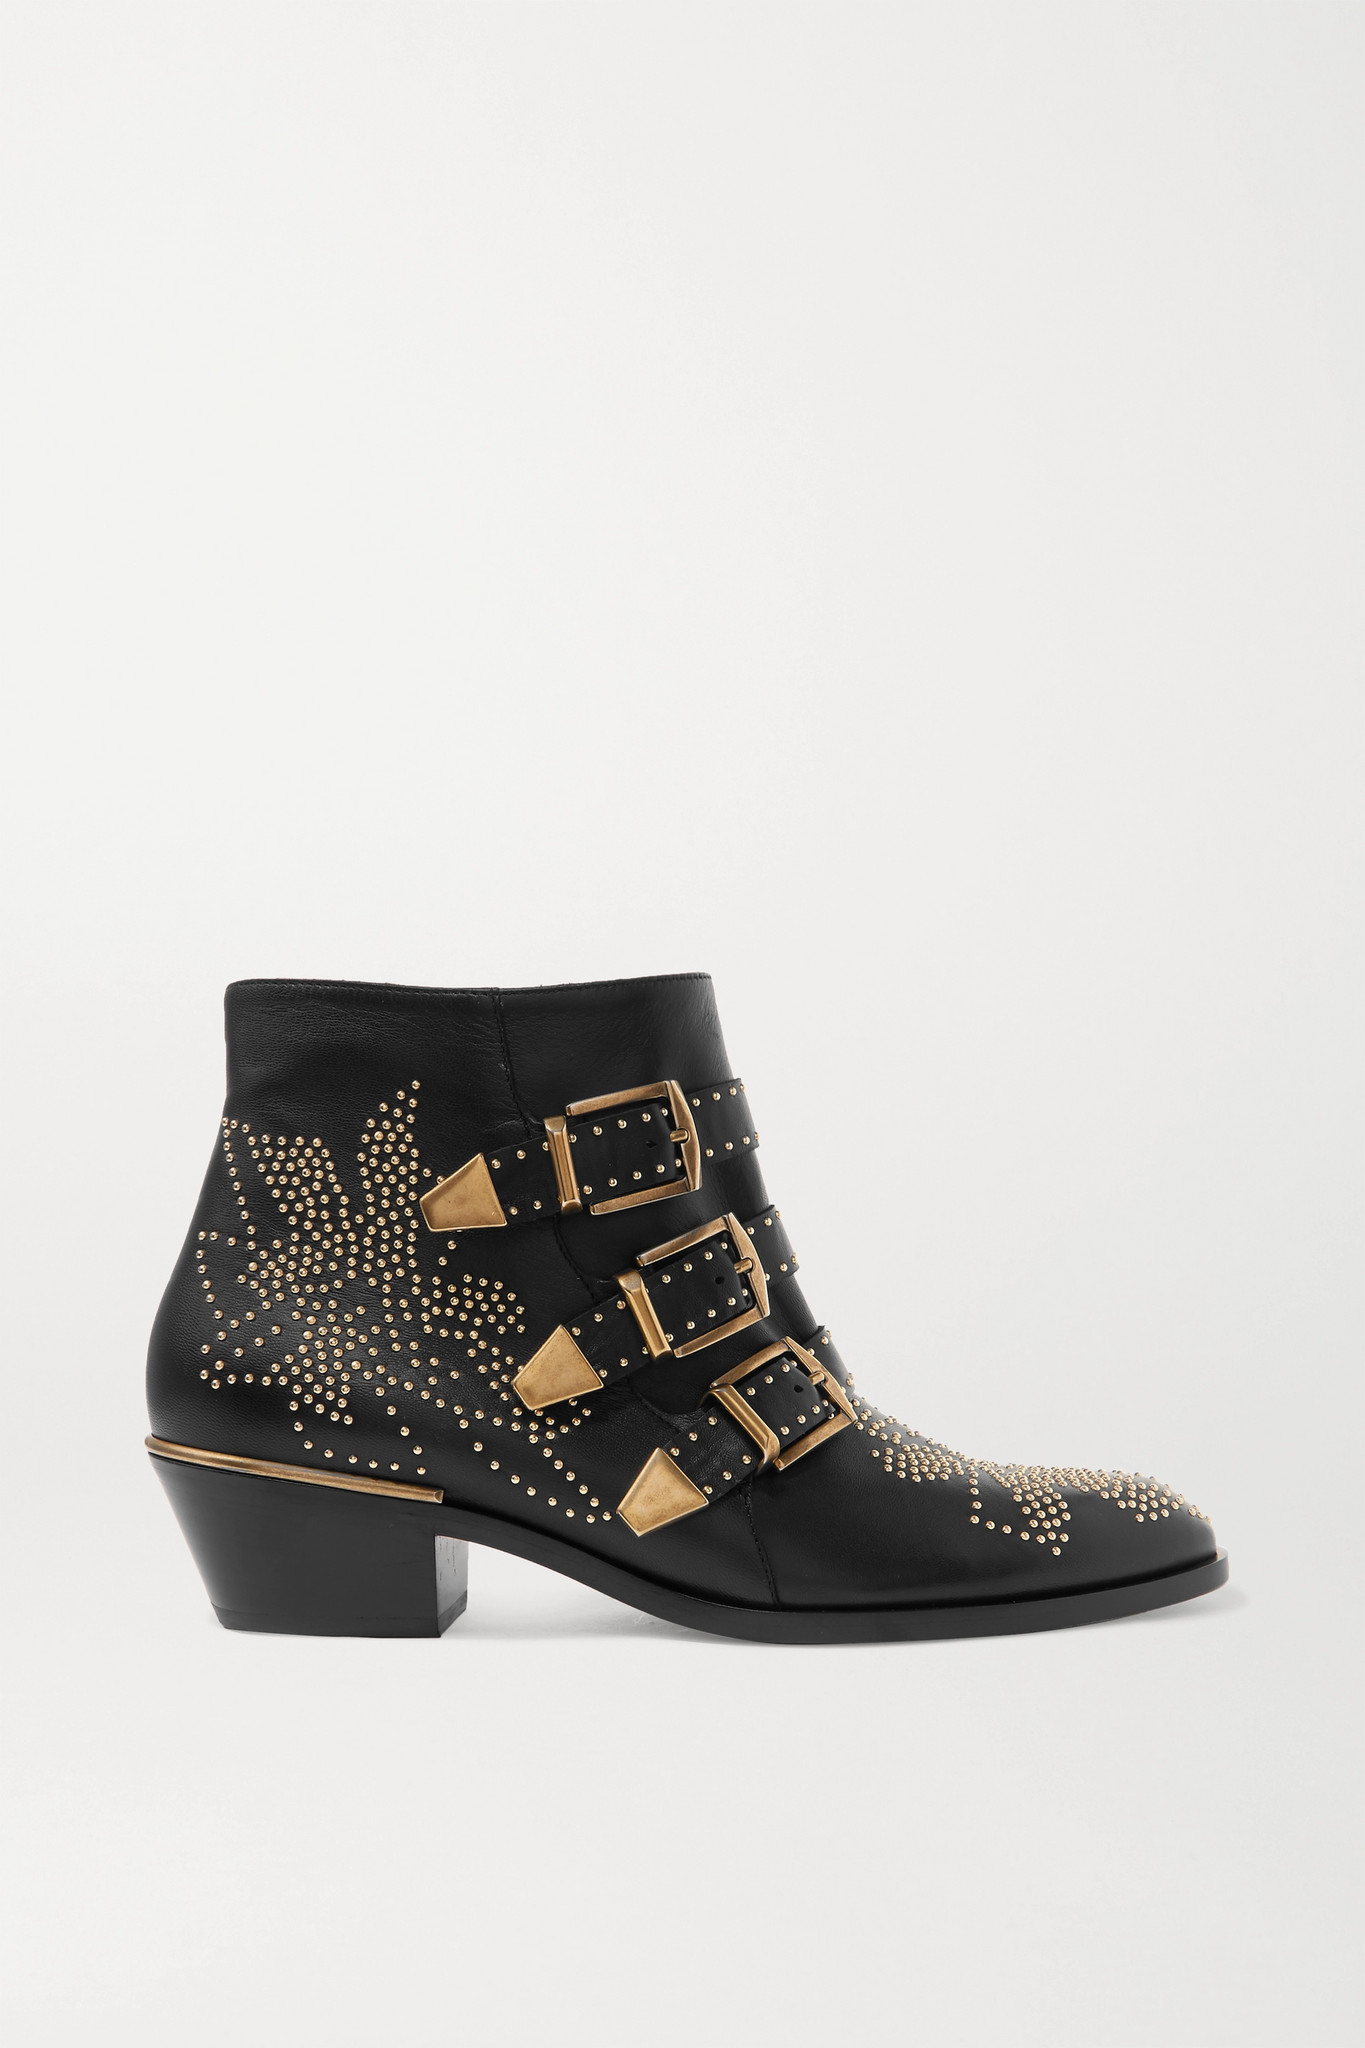 CHLOÉ - Susanna 铆钉皮革踝靴 - 黑色 - IT42